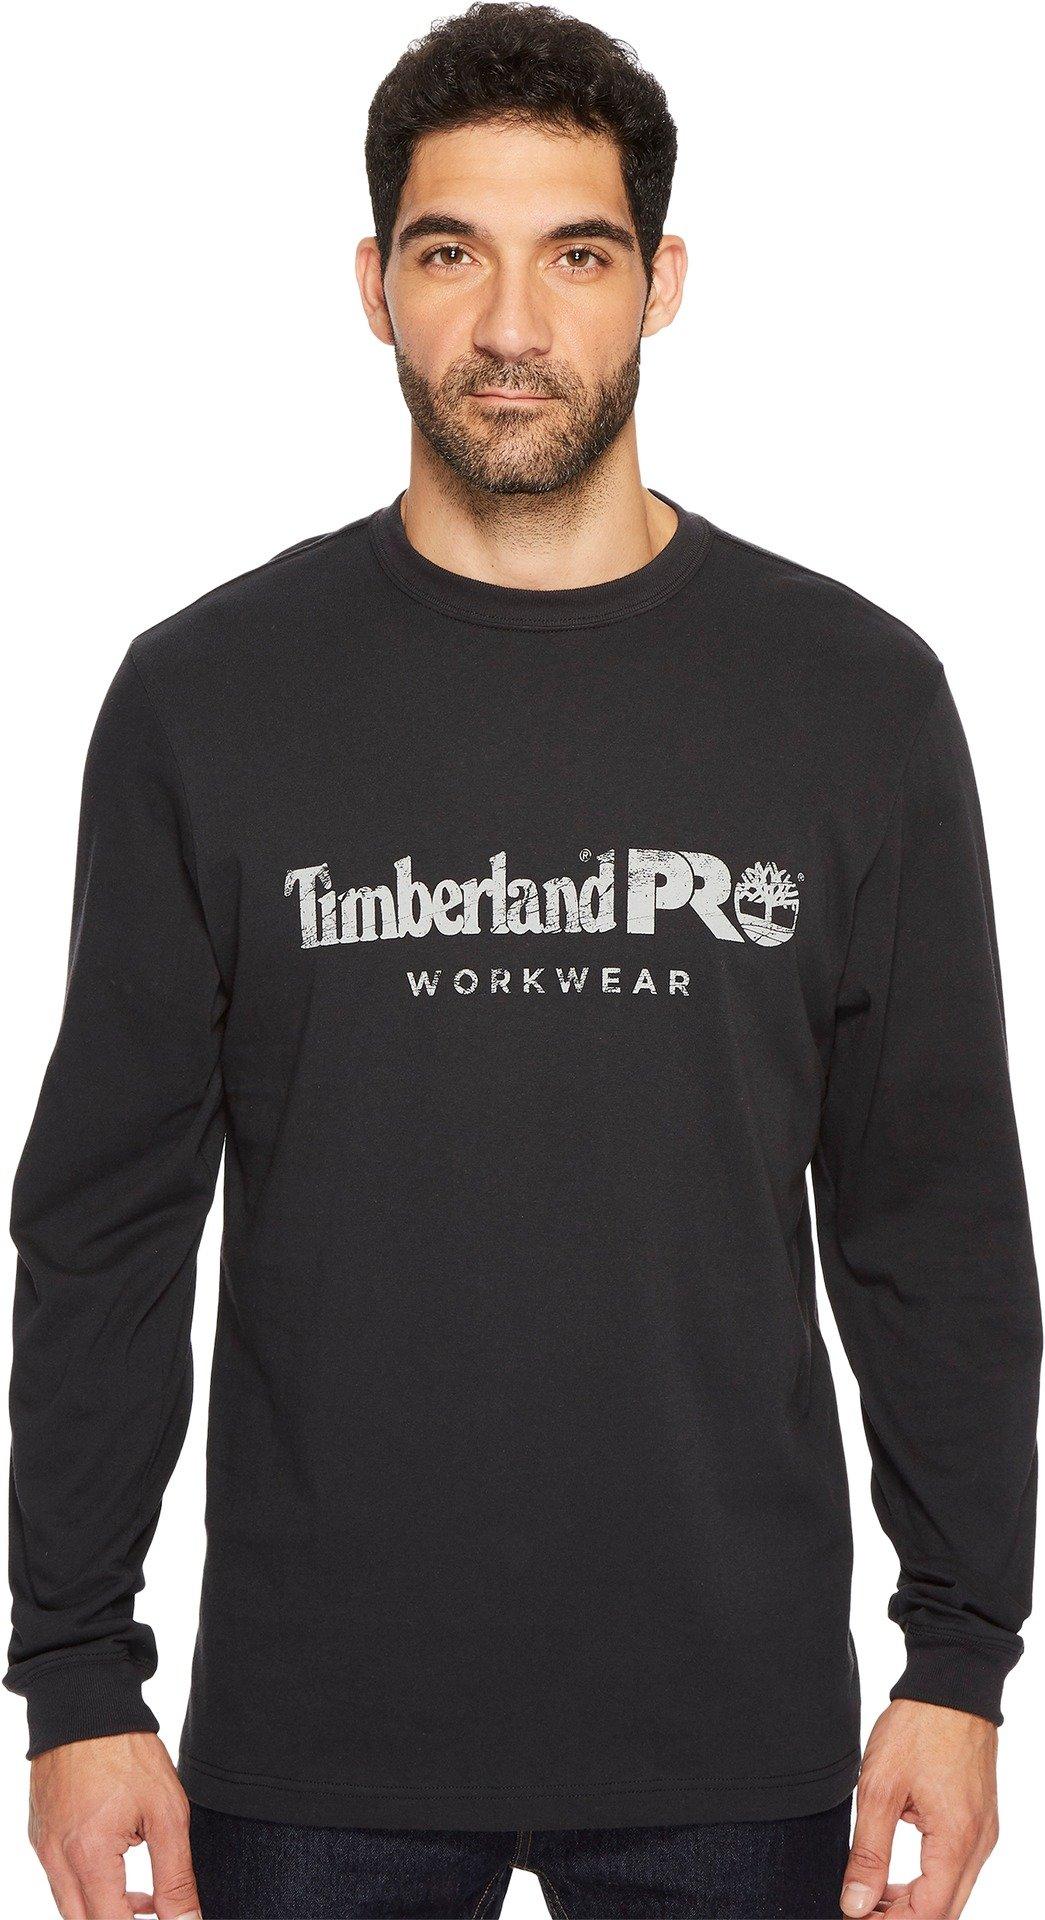 Timberland PRO Men's Cotton Core Long-Sleeve T-Shirt, Jet Black, Large